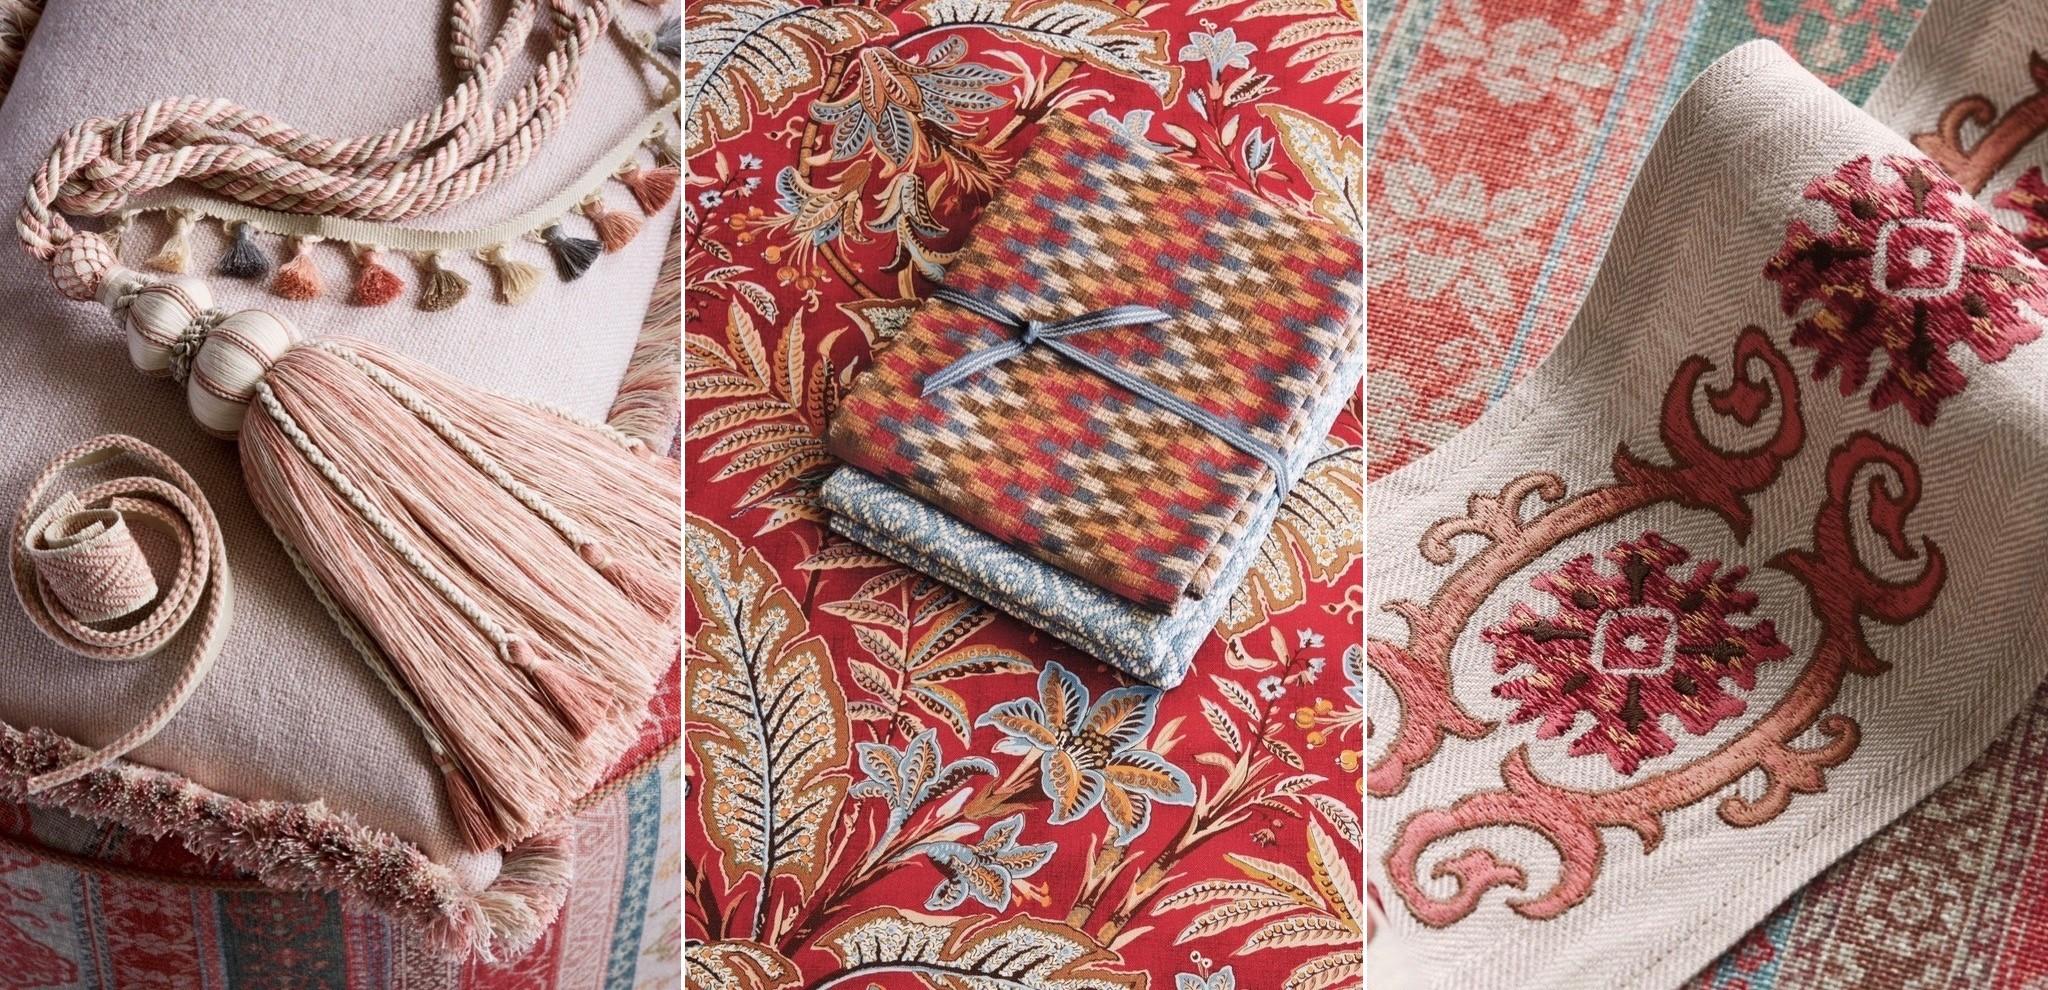 3 exemples de tissu d'ameublement